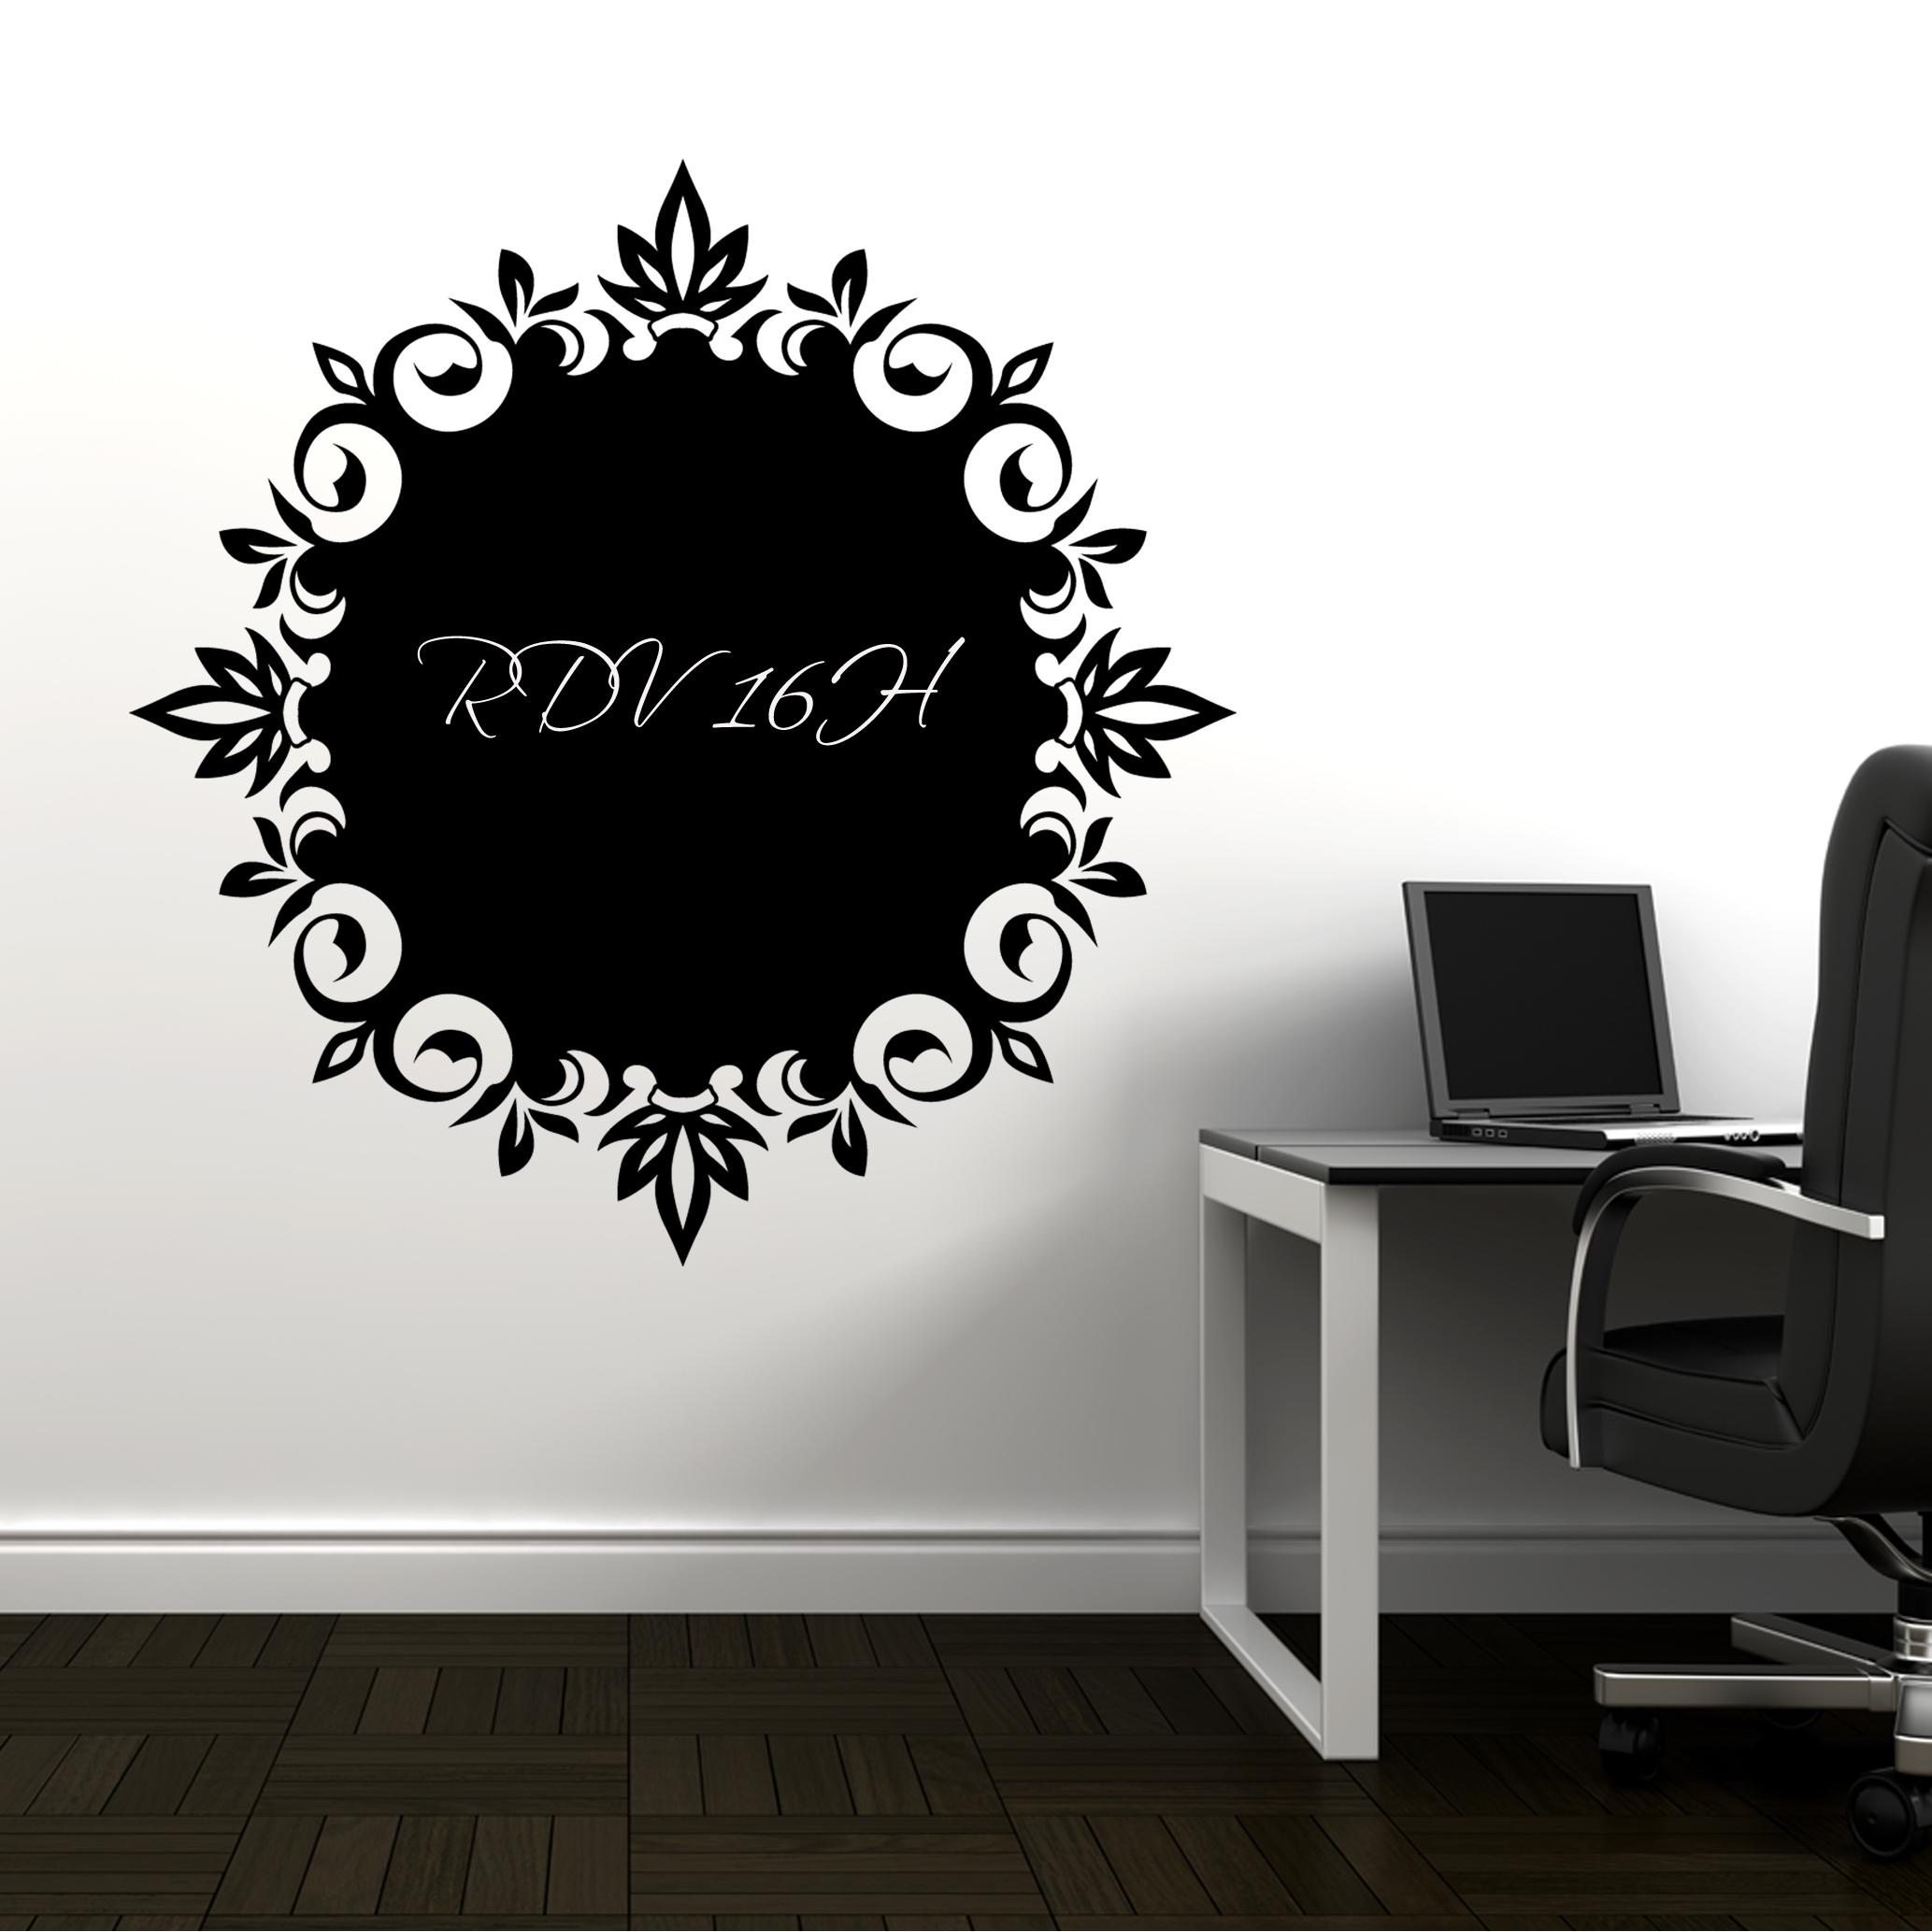 stickers ardoise ornement des prix 50 moins cher qu 39 en magasin. Black Bedroom Furniture Sets. Home Design Ideas